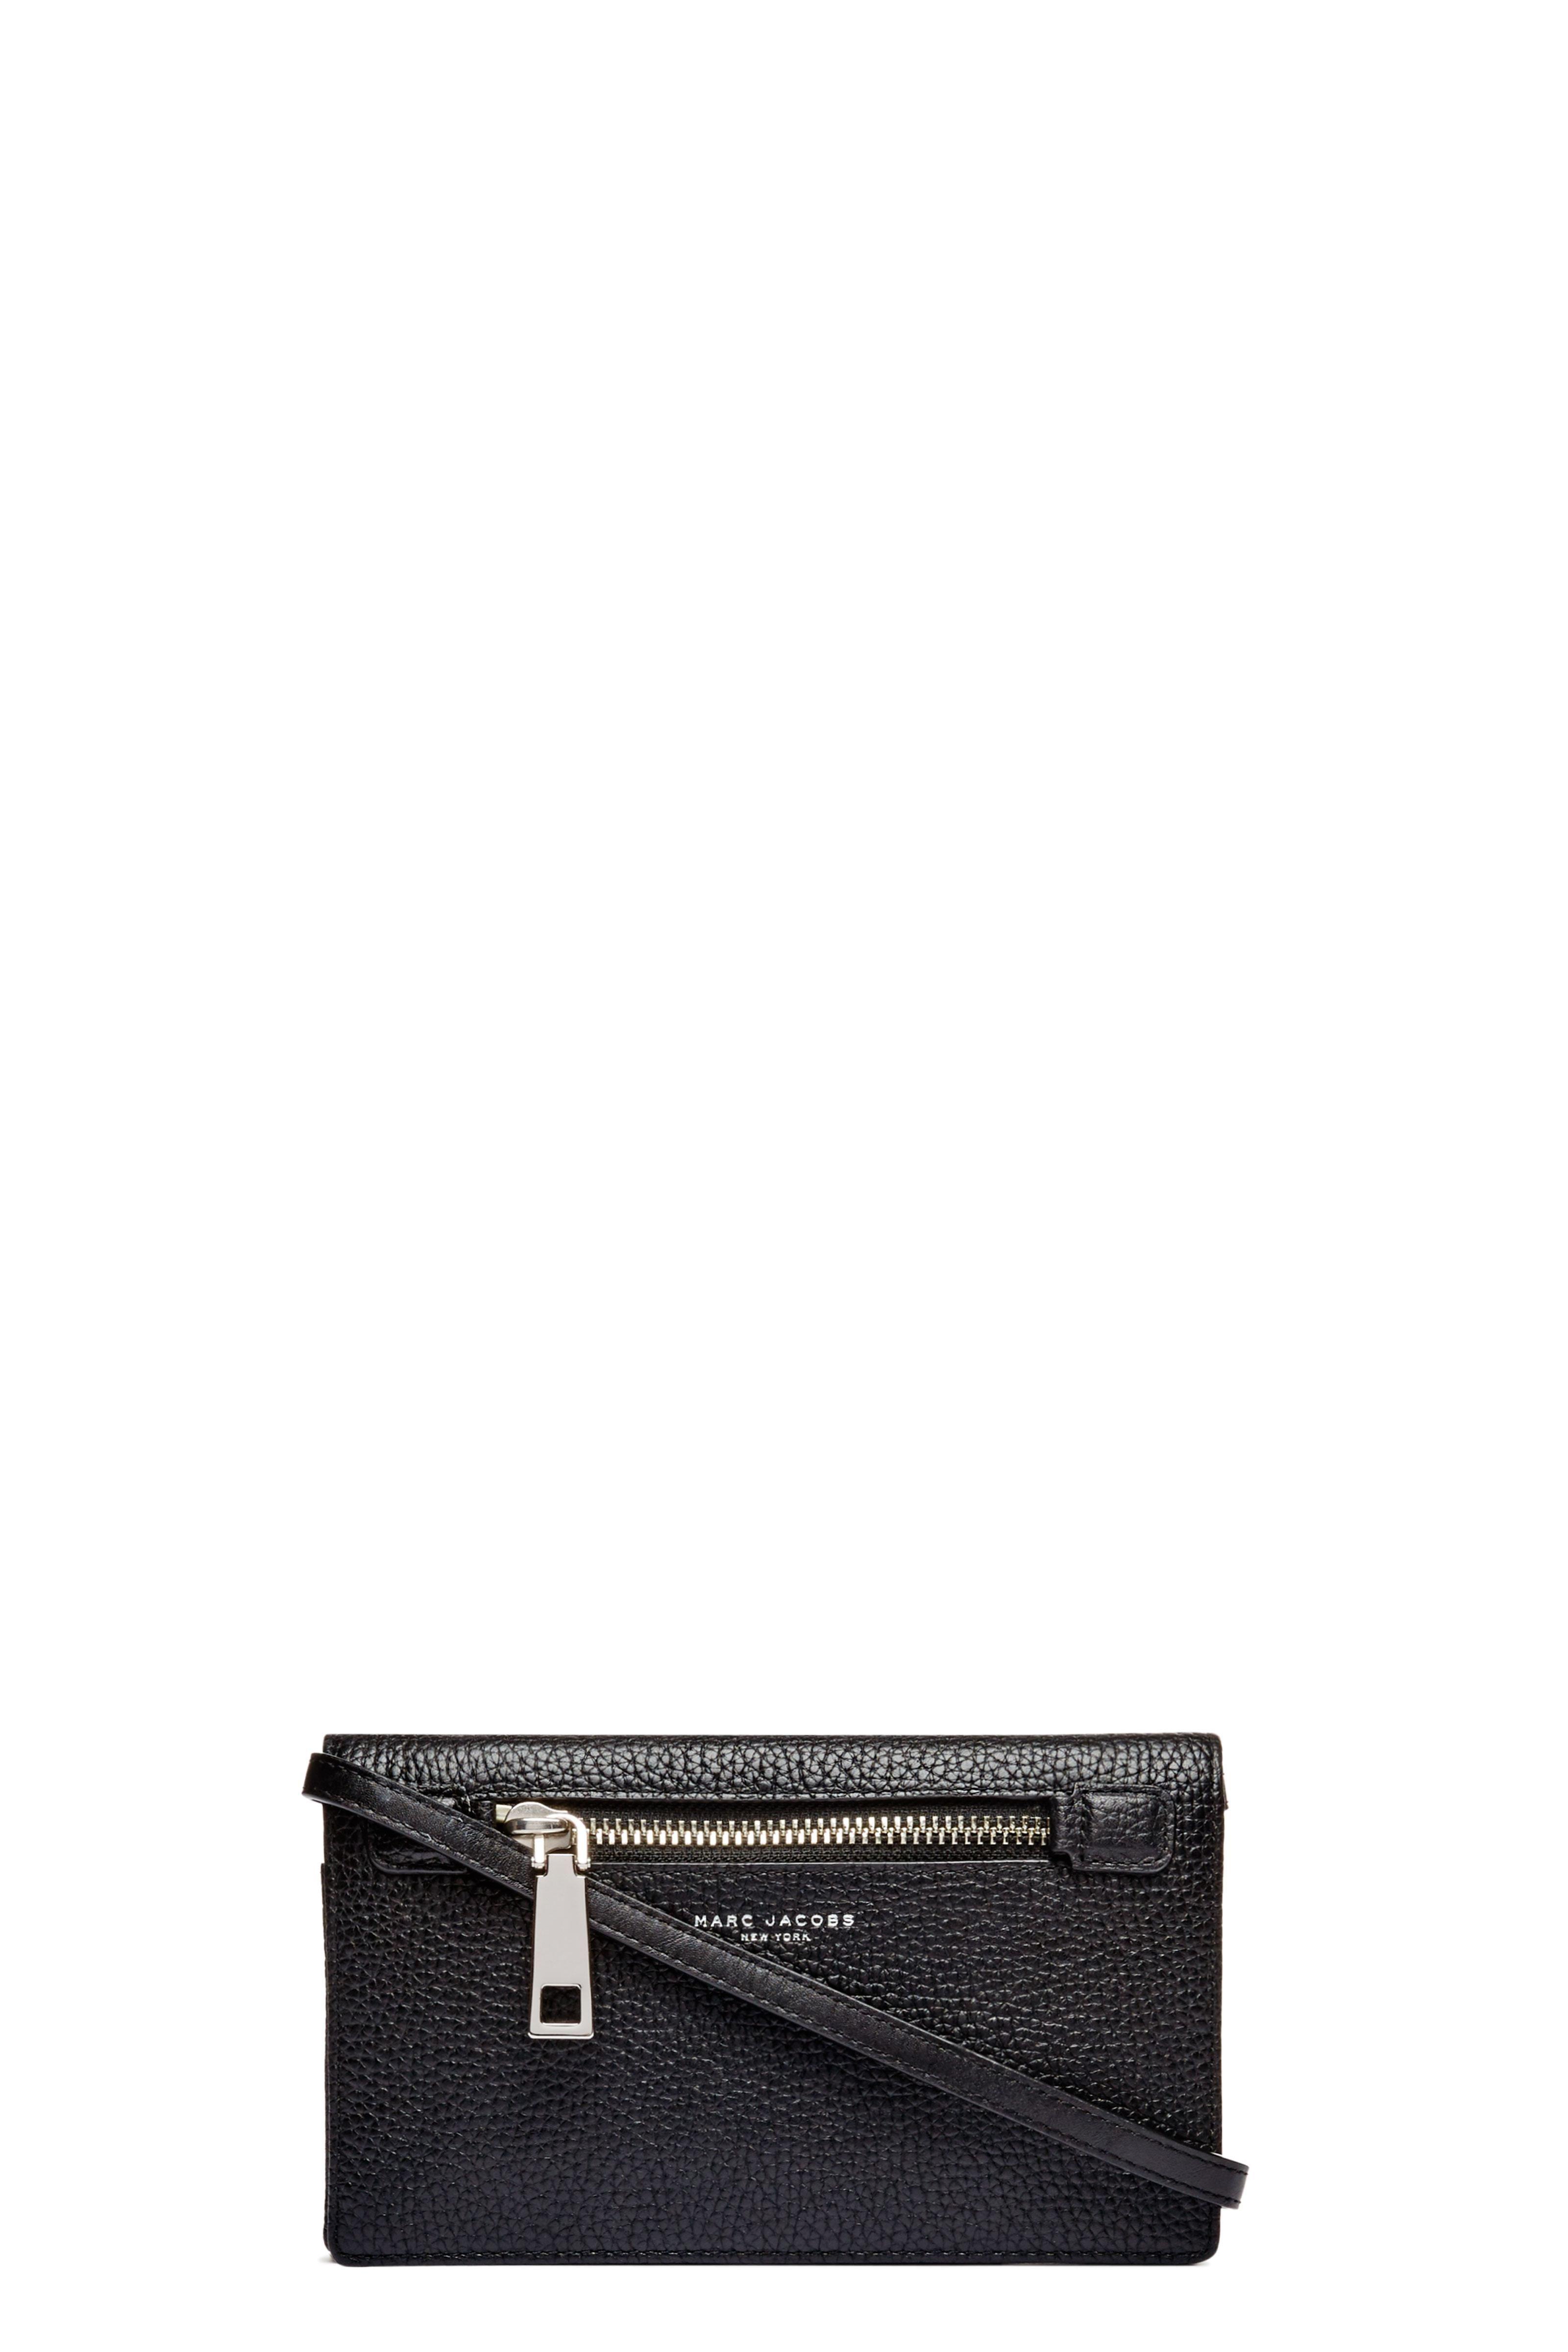 f9988c8b39 Marc Jacobs Bag, Leather Wallet, Tie Clip, Crossbody Bag, Wallets, Marc